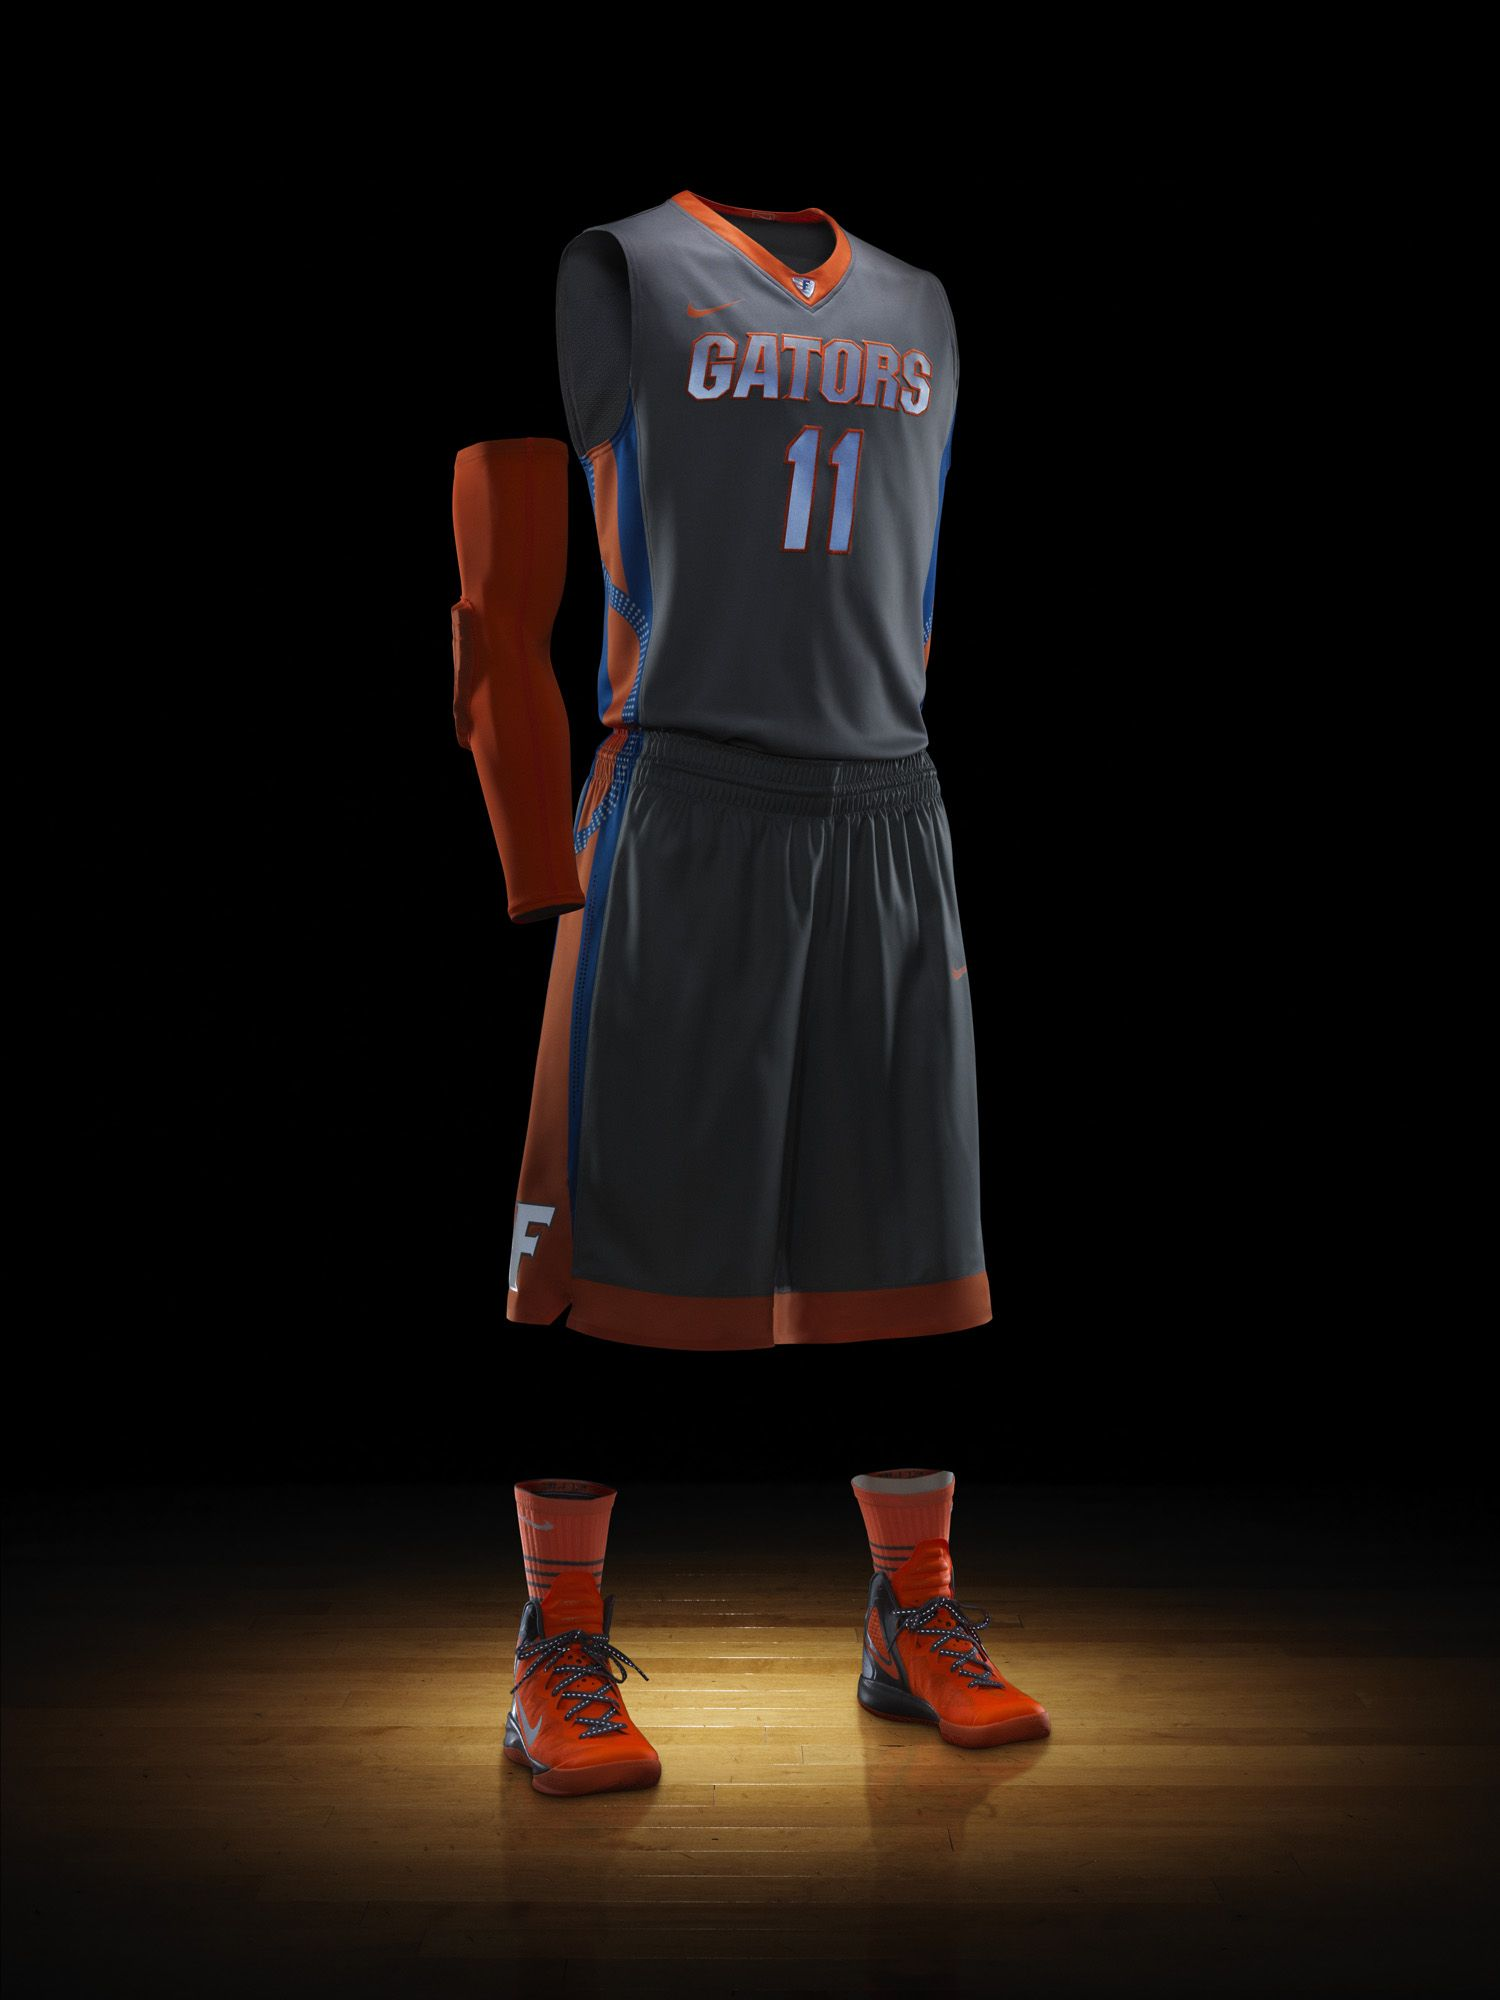 aae2e080136d03 Florida to wear Nike Hyper Elite Platinum uniforms